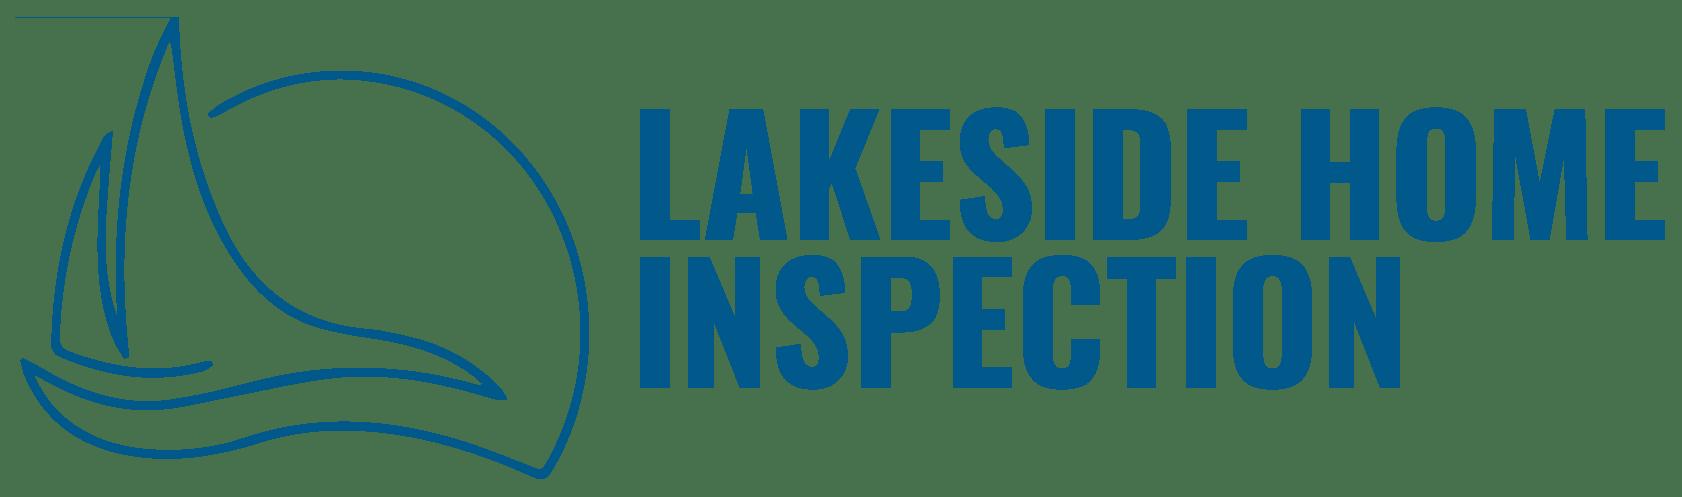 Lakeside Home Inspection Logo